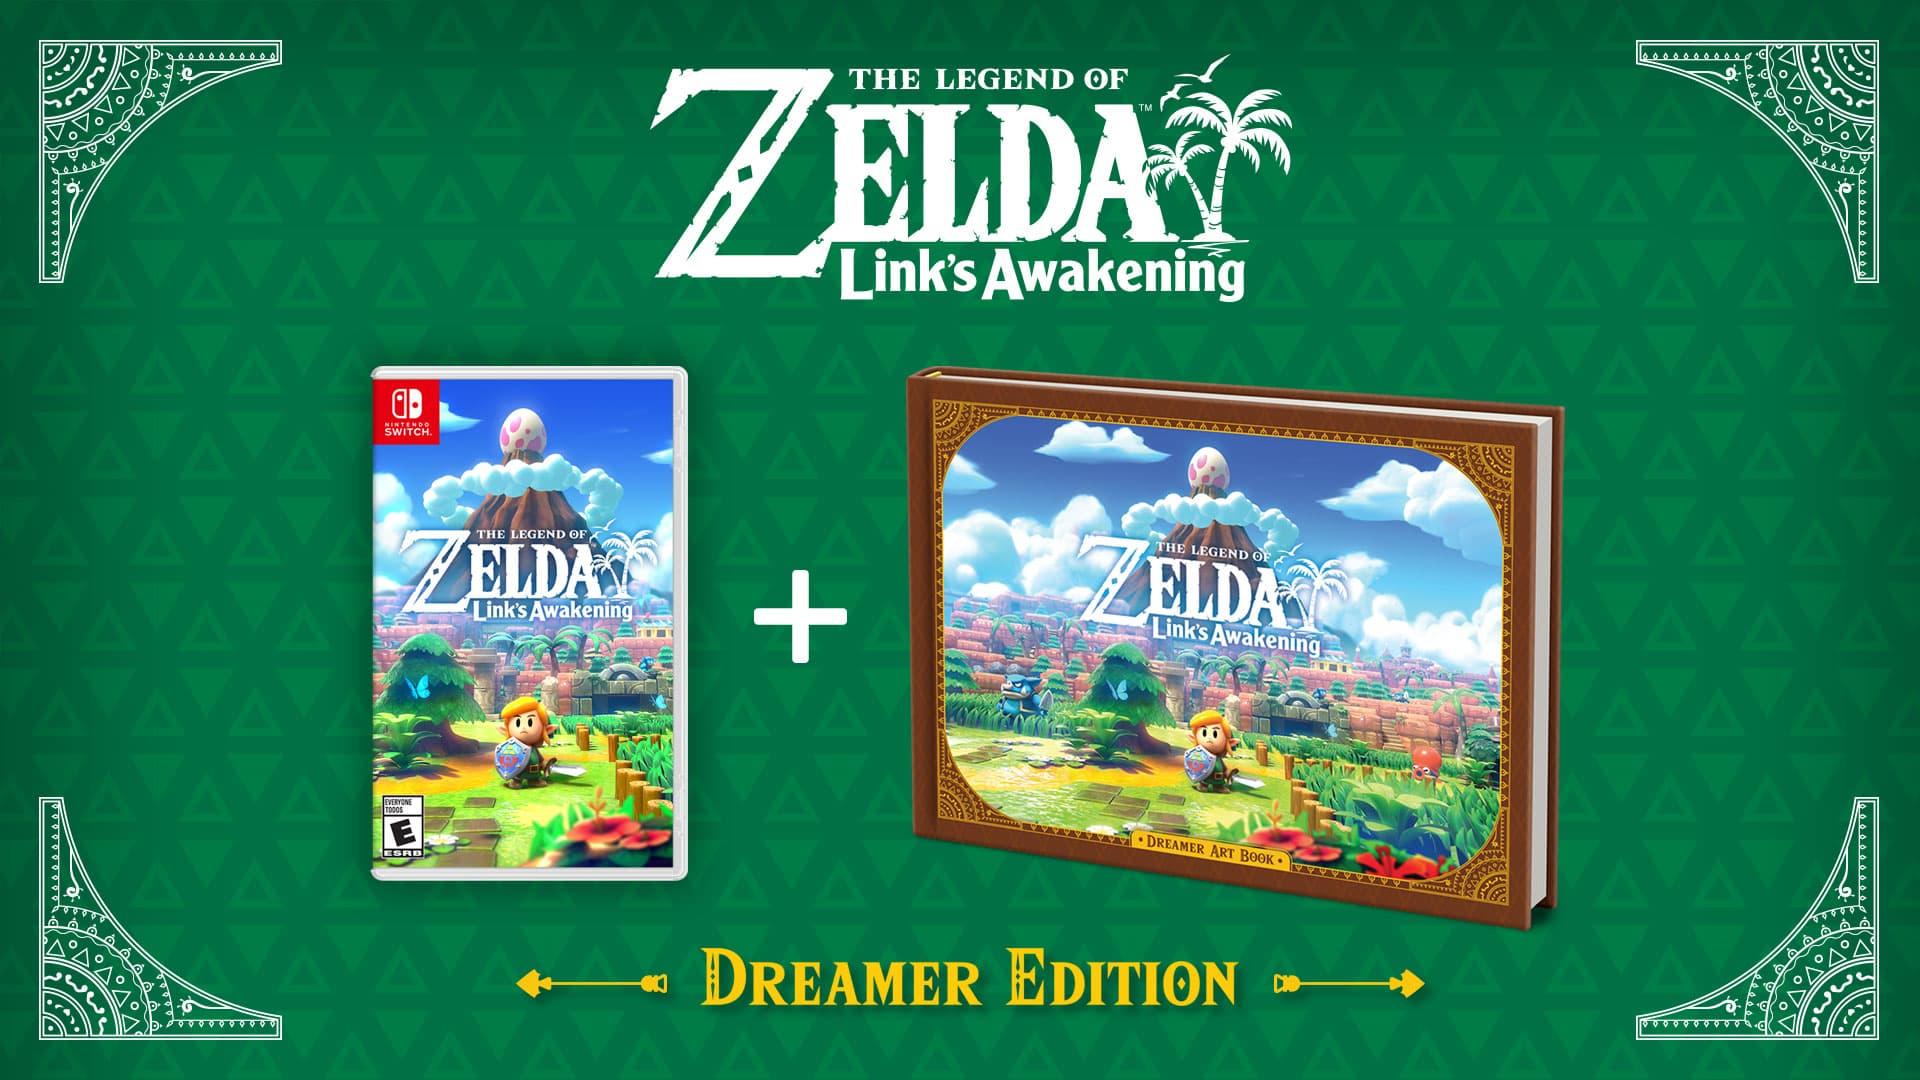 The Legend of Zelda: Link's Awakening in arrivo il 20 settembre su Nintendo Switch 1